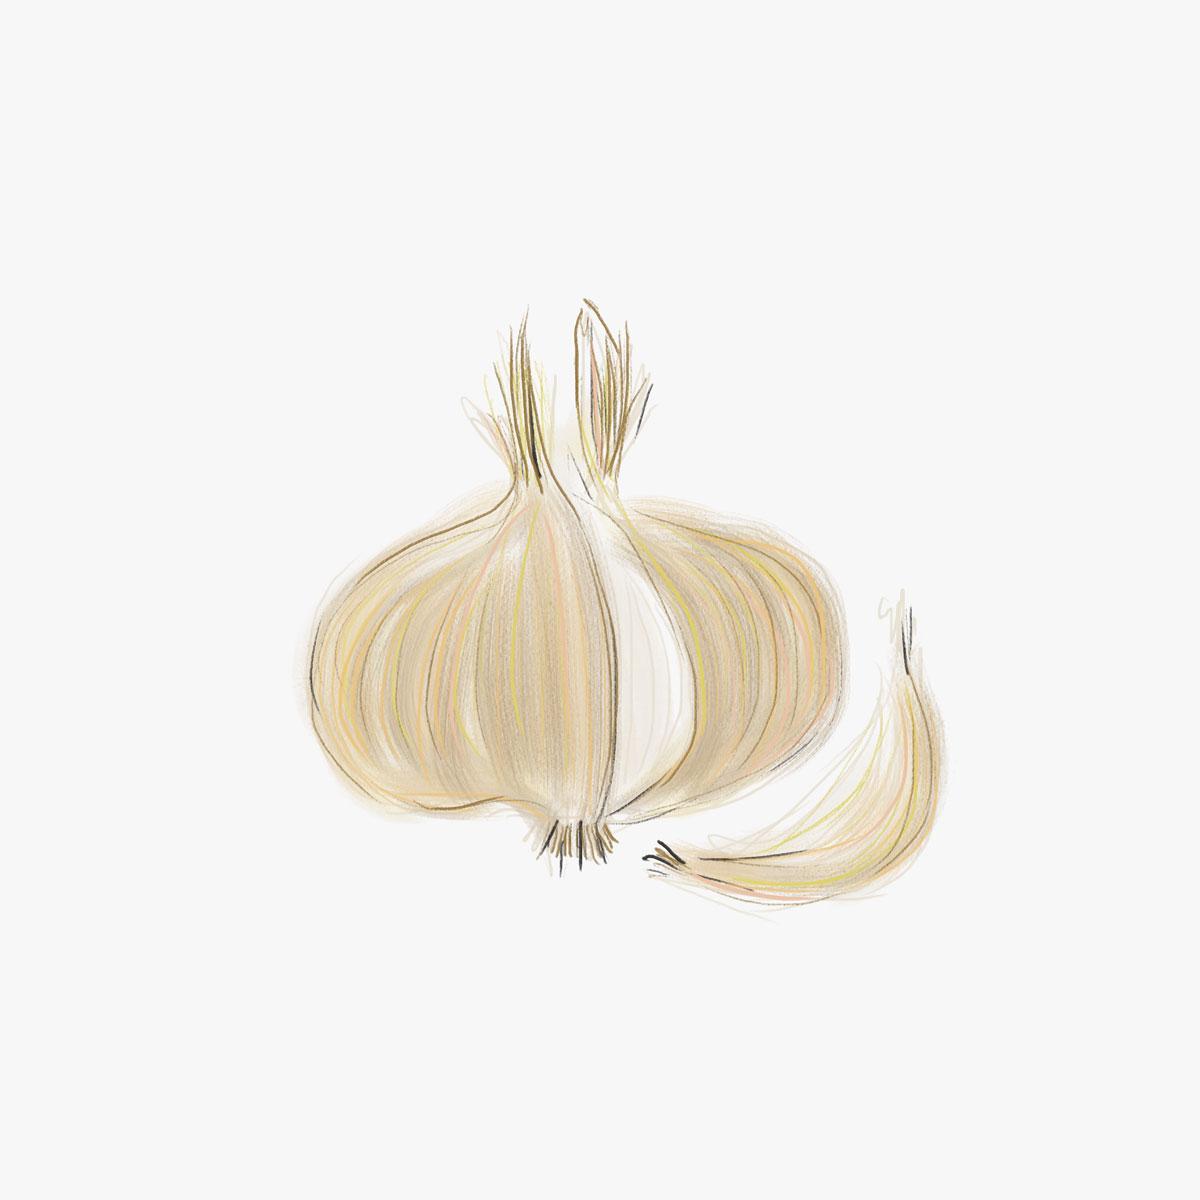 052-Onion.jpg